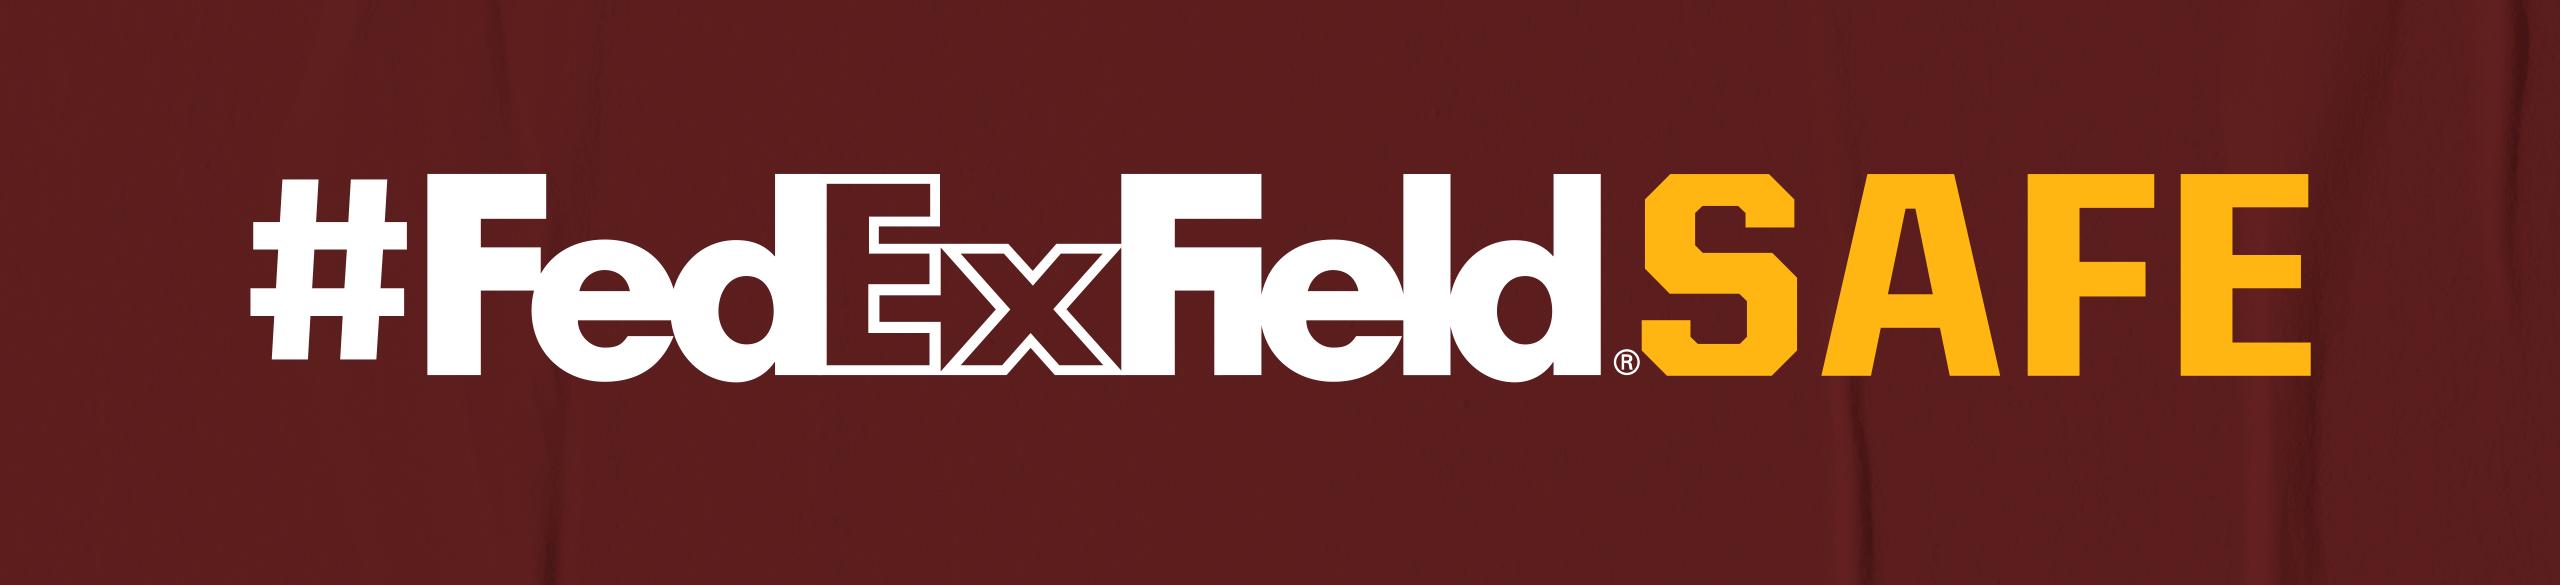 FXF-safe-Header